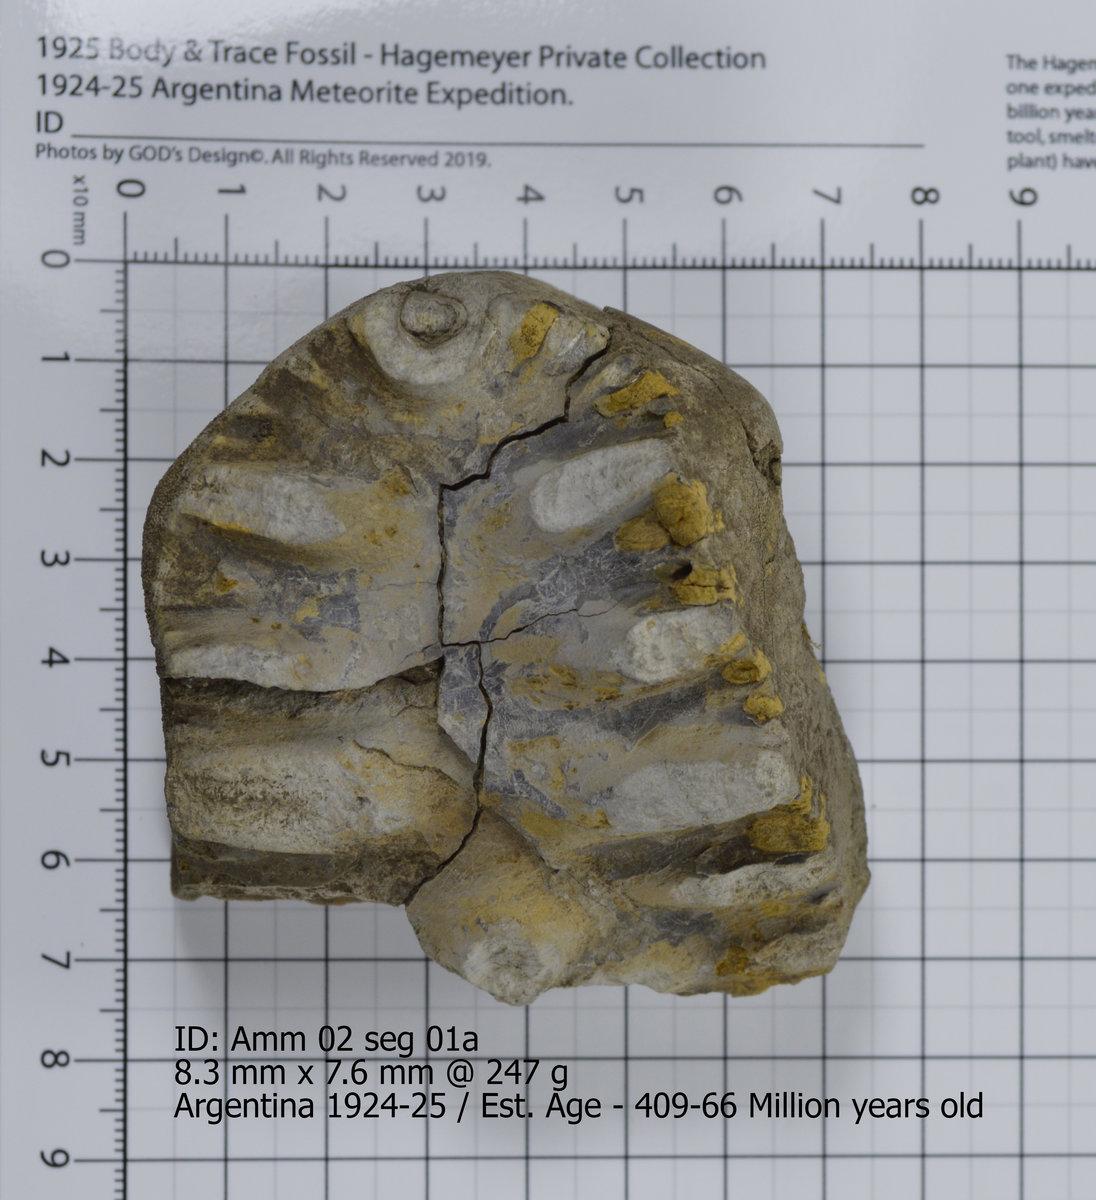 Ammonite 02 seg 01a.jpg